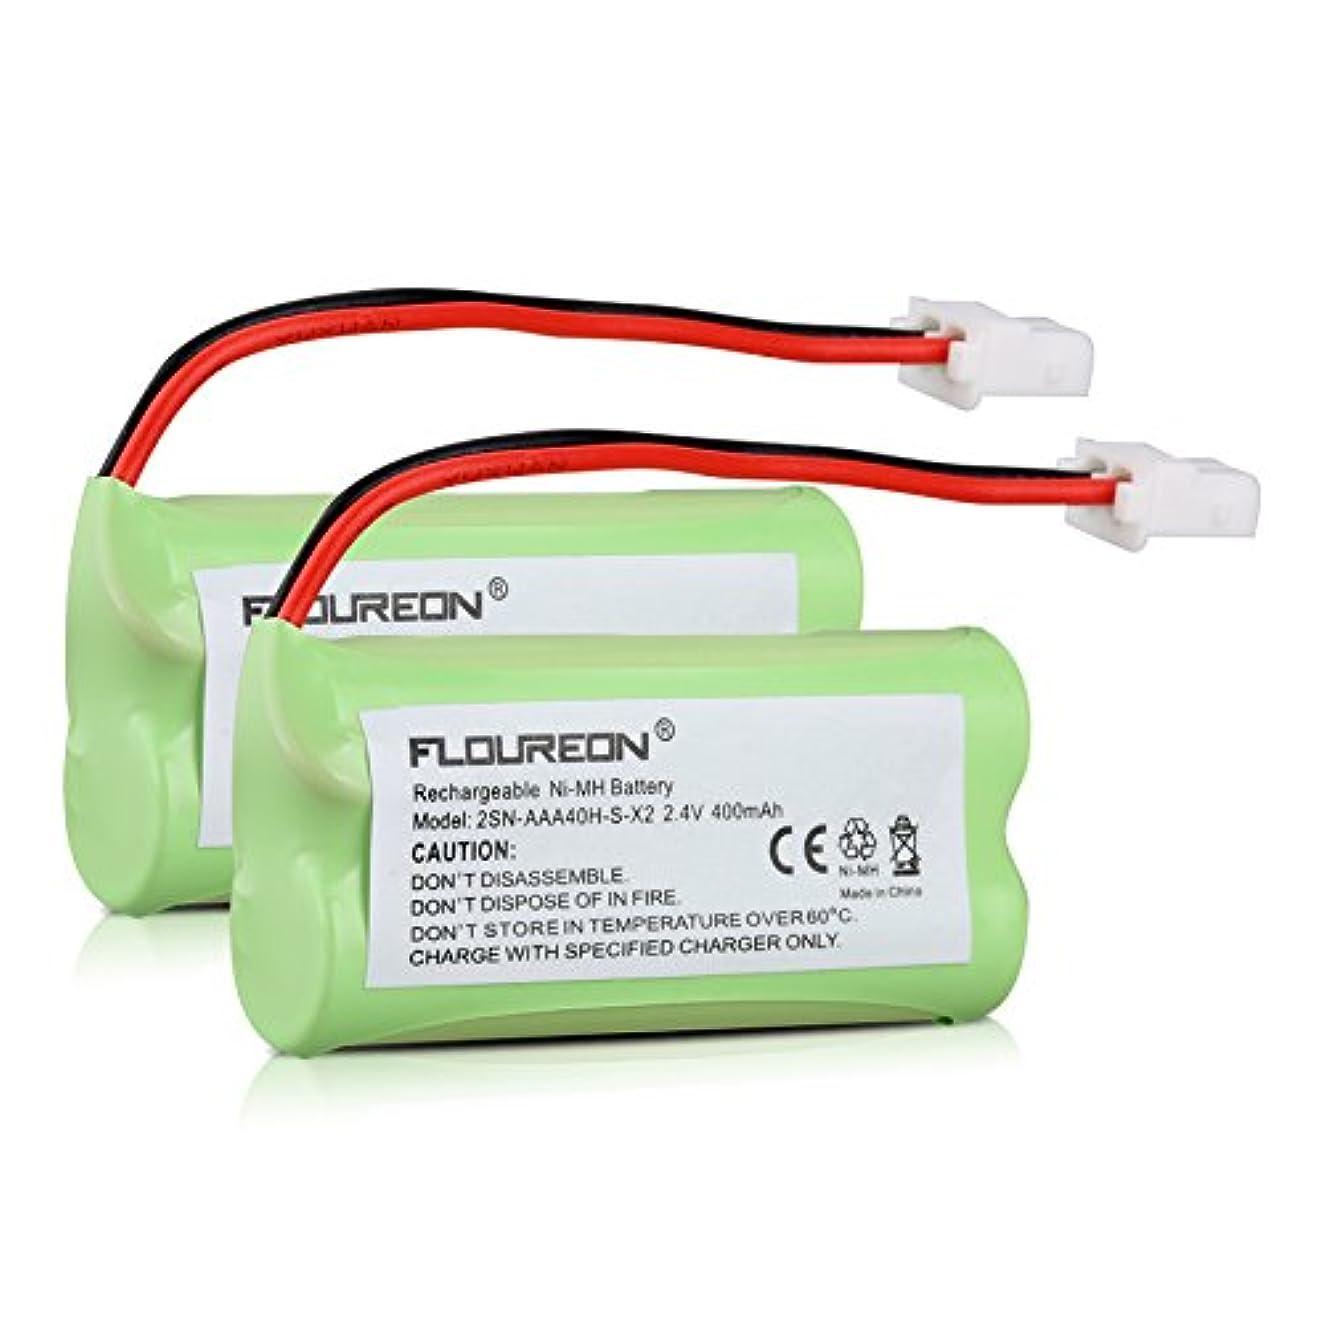 Floureon 2 Packs 2.4V 400mAh Rechargeable Cordless Phone Telephone Batteries for BT-183342, BT262342 BT266342 BT283342 BT162342 TL86009 TL86109 EL52251